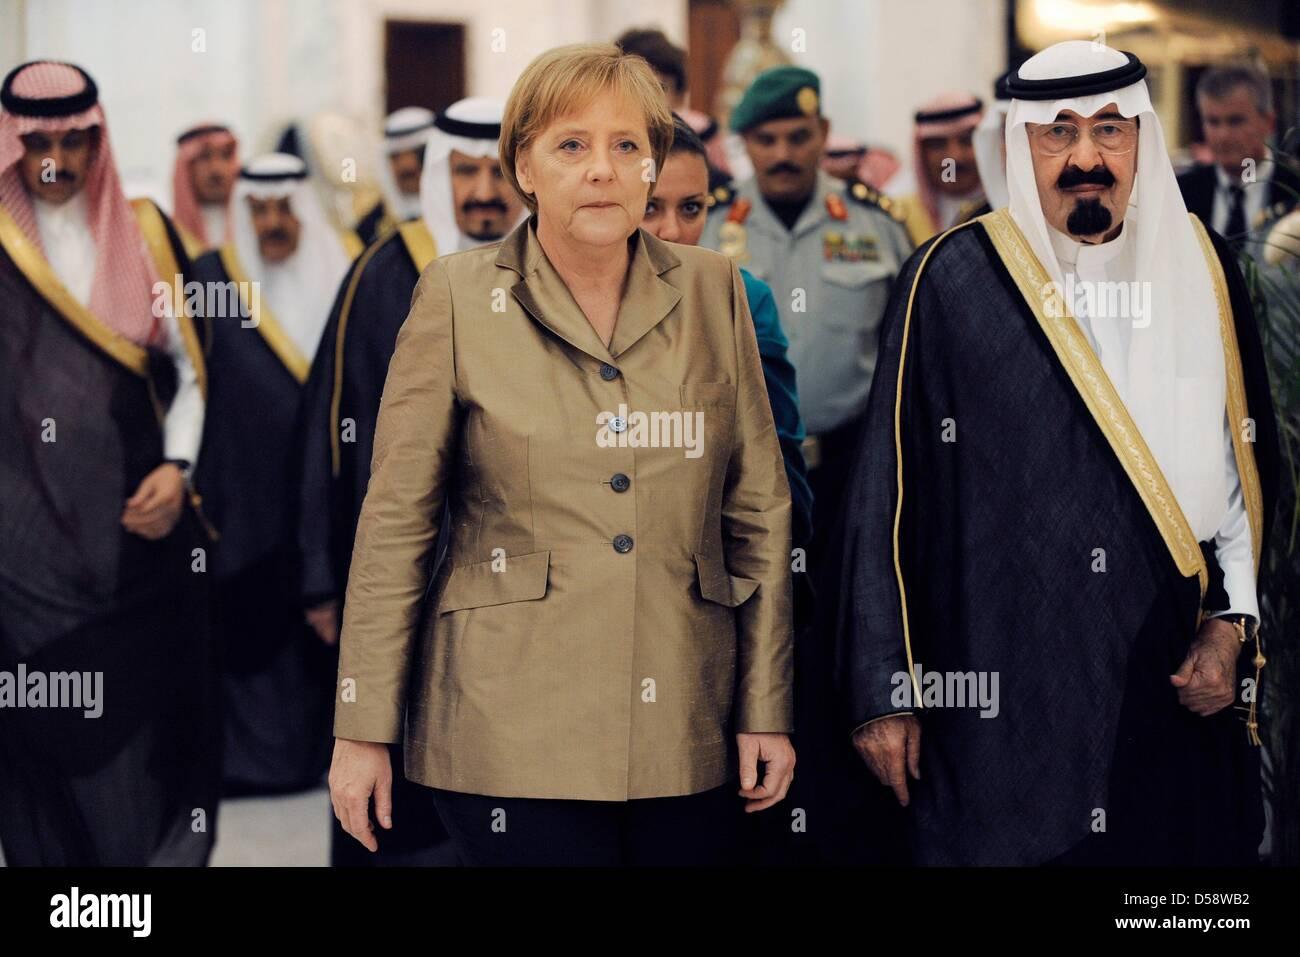 Bundeskanzlerin Angela Merkel (CDU) geht am Dienstag (25.05.2010) im Palast des Königs in Djidda (Saudi-Arabien) Immagini Stock